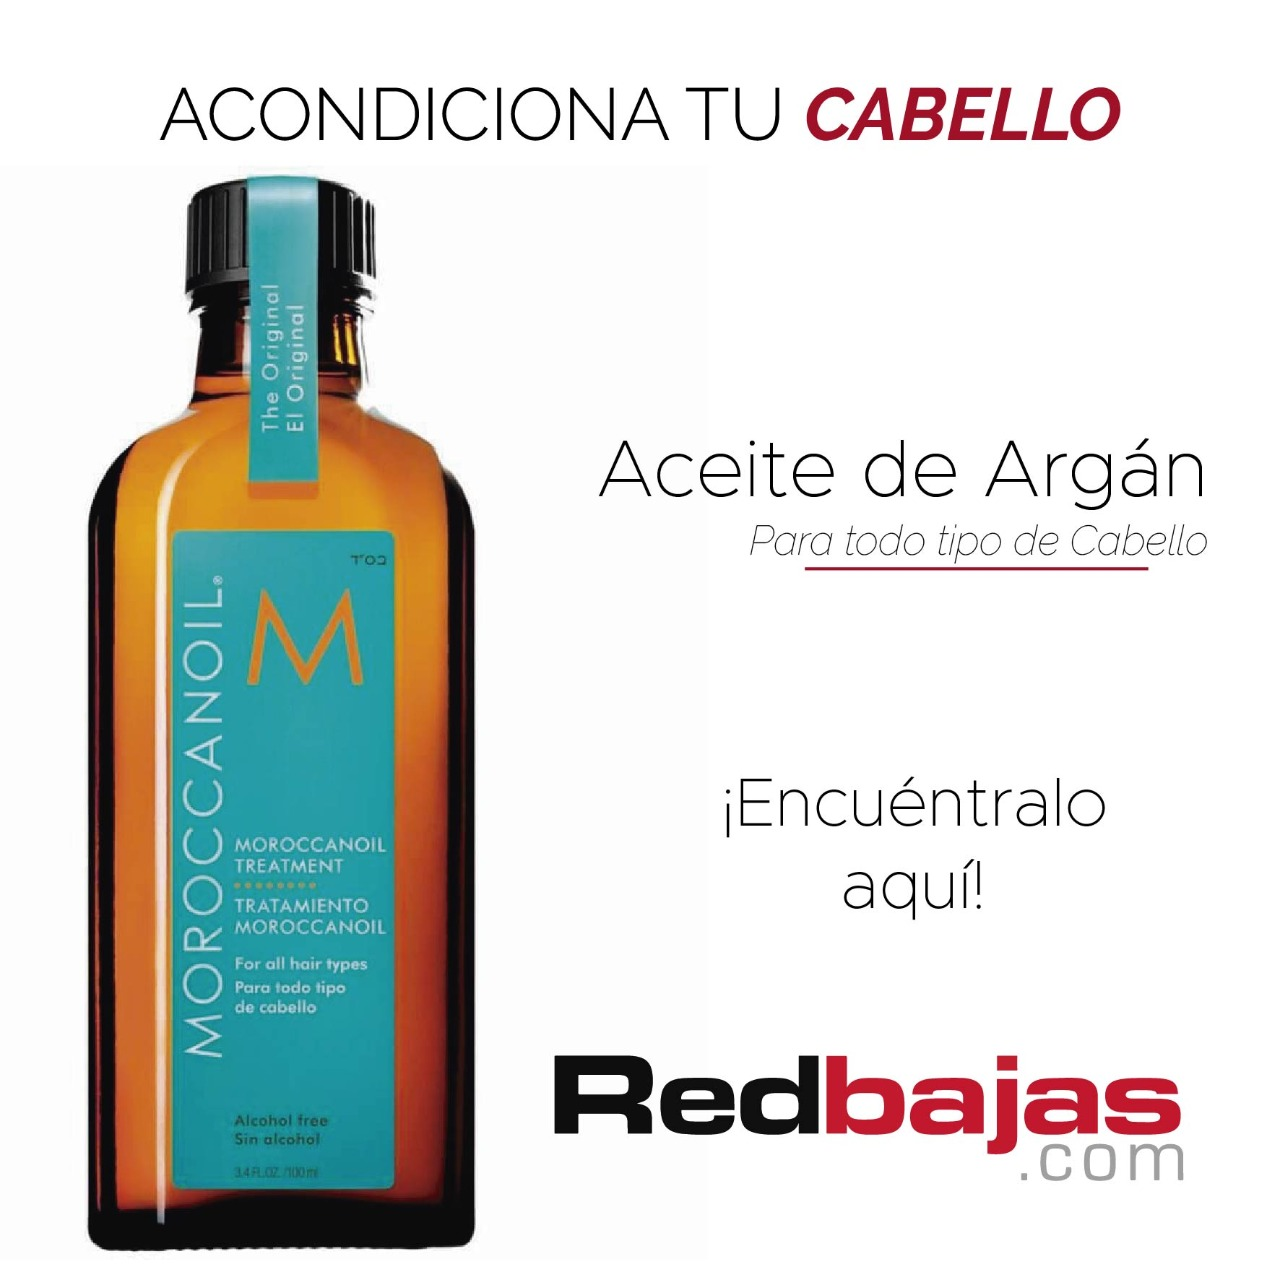 Aceite de Moroccanoil